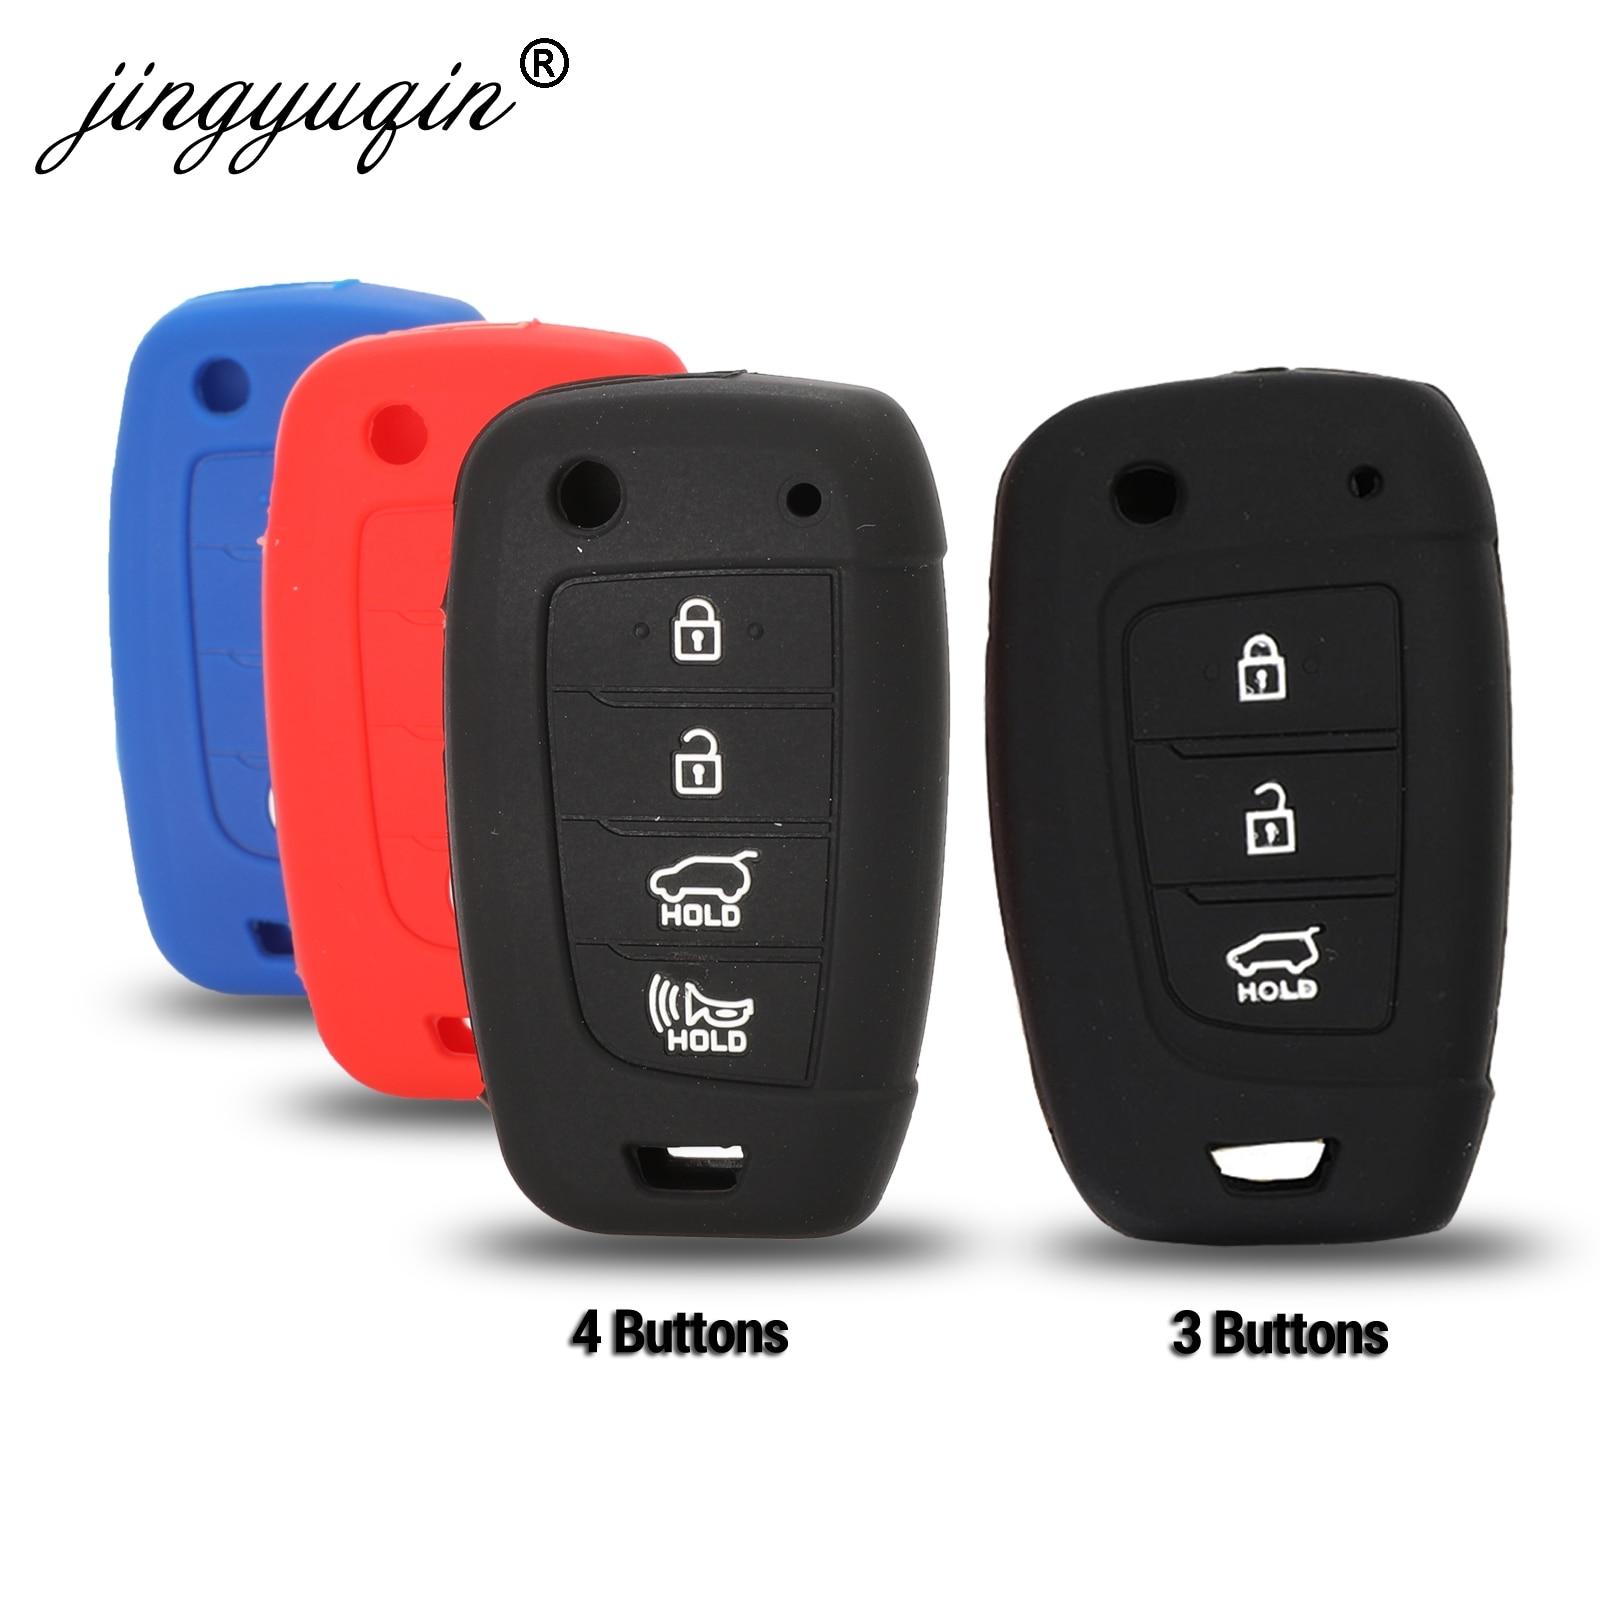 jingyuqin Car Flip Key Case Silicone for Hyundai Elantra Solaris 2016 2017 2018 3/4 Buttons Folding Remote Key Coverjingyuqin Car Flip Key Case Silicone for Hyundai Elantra Solaris 2016 2017 2018 3/4 Buttons Folding Remote Key Cover